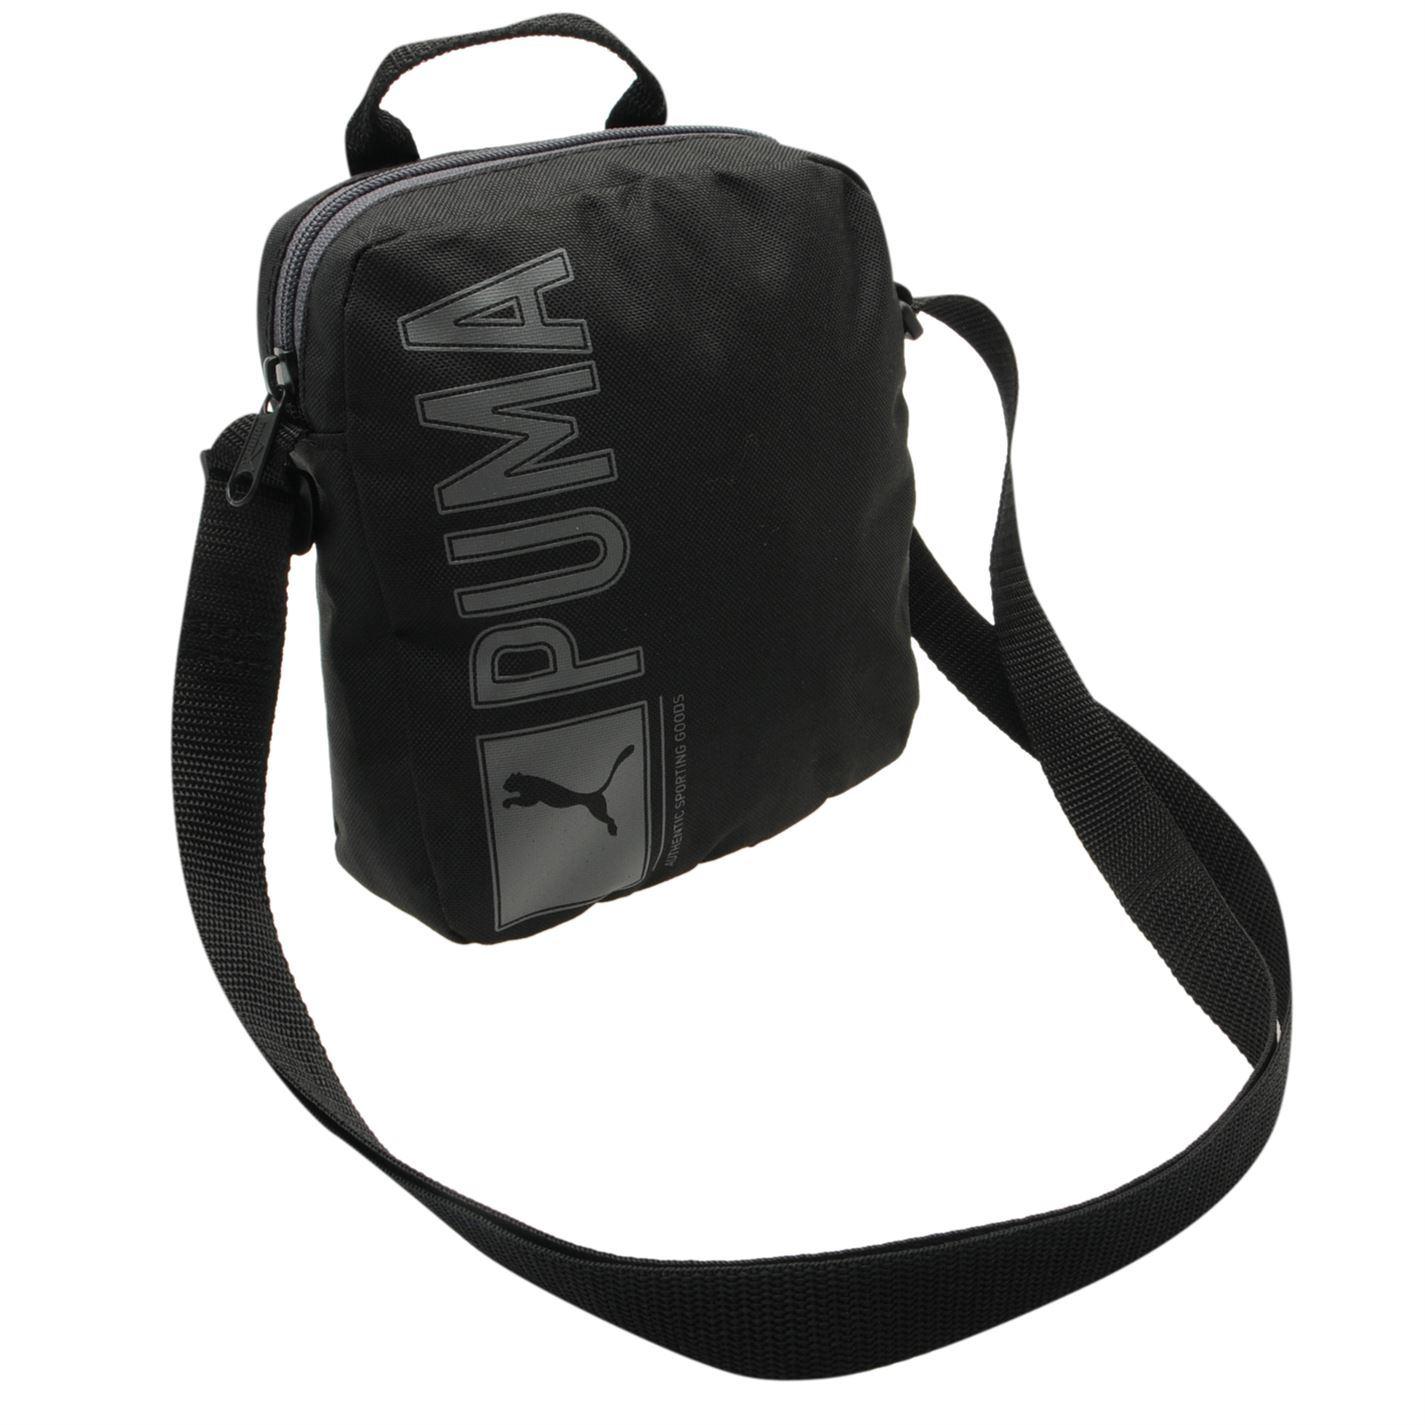 Puma Unisex Pioneer Portable 72 Shoulder Messenger Cross Body ... 66b6b03e88